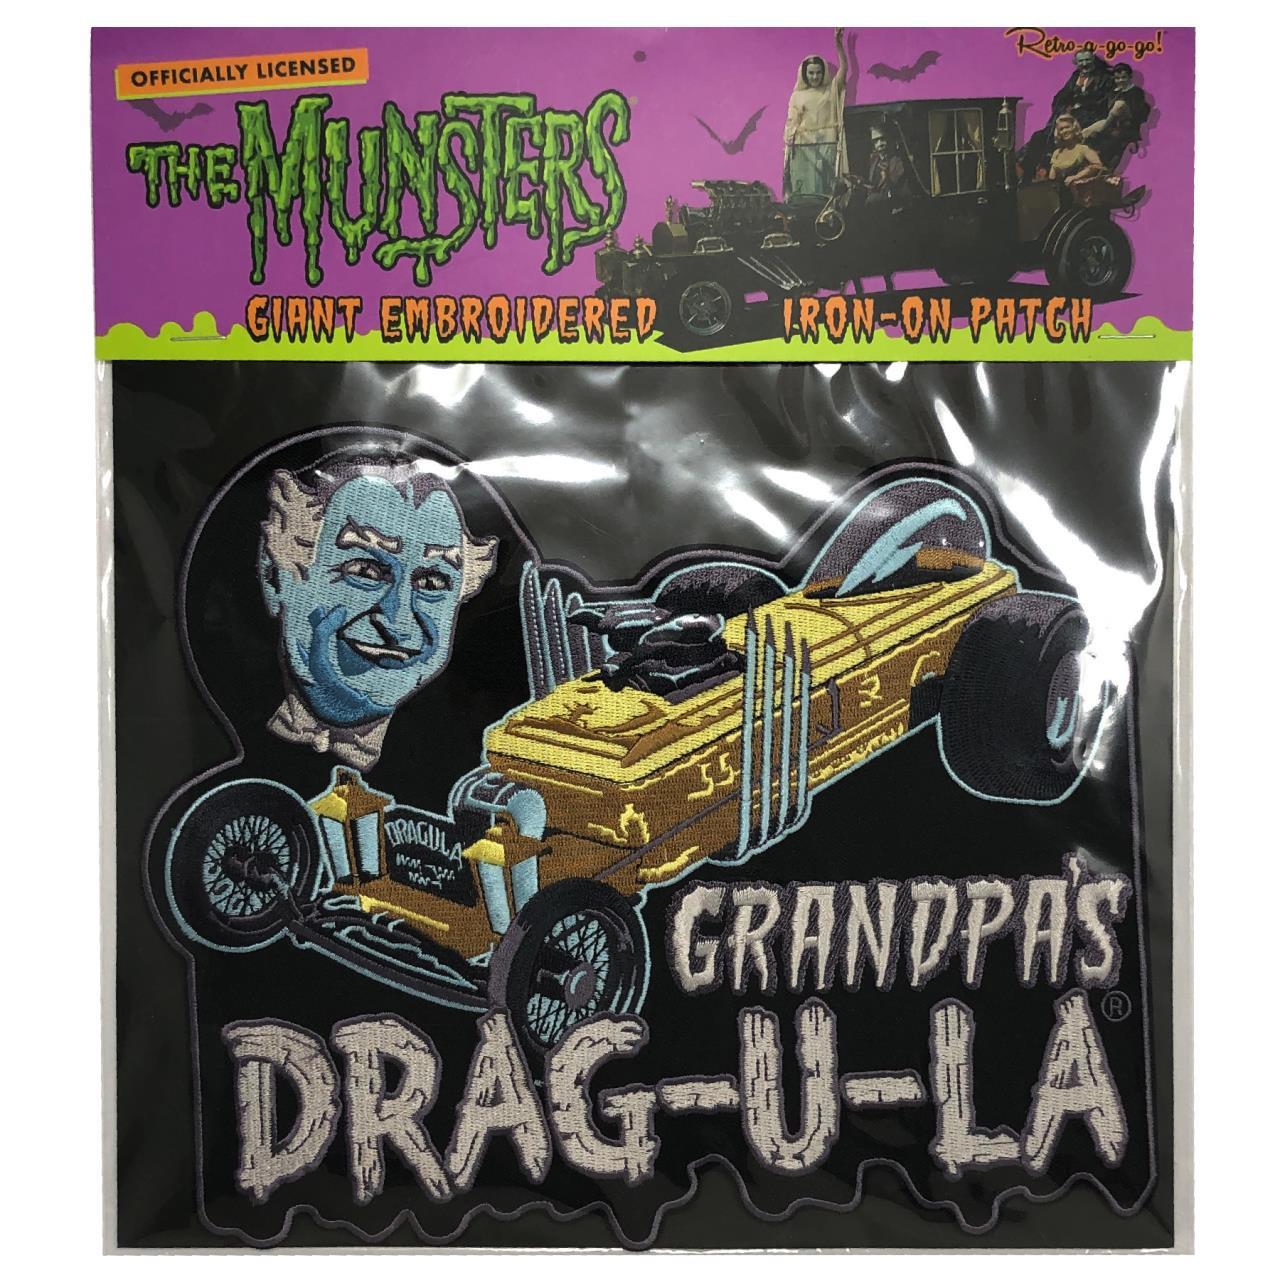 Grandpa's DRAG-U-LA Back Patch* - 0659682815541